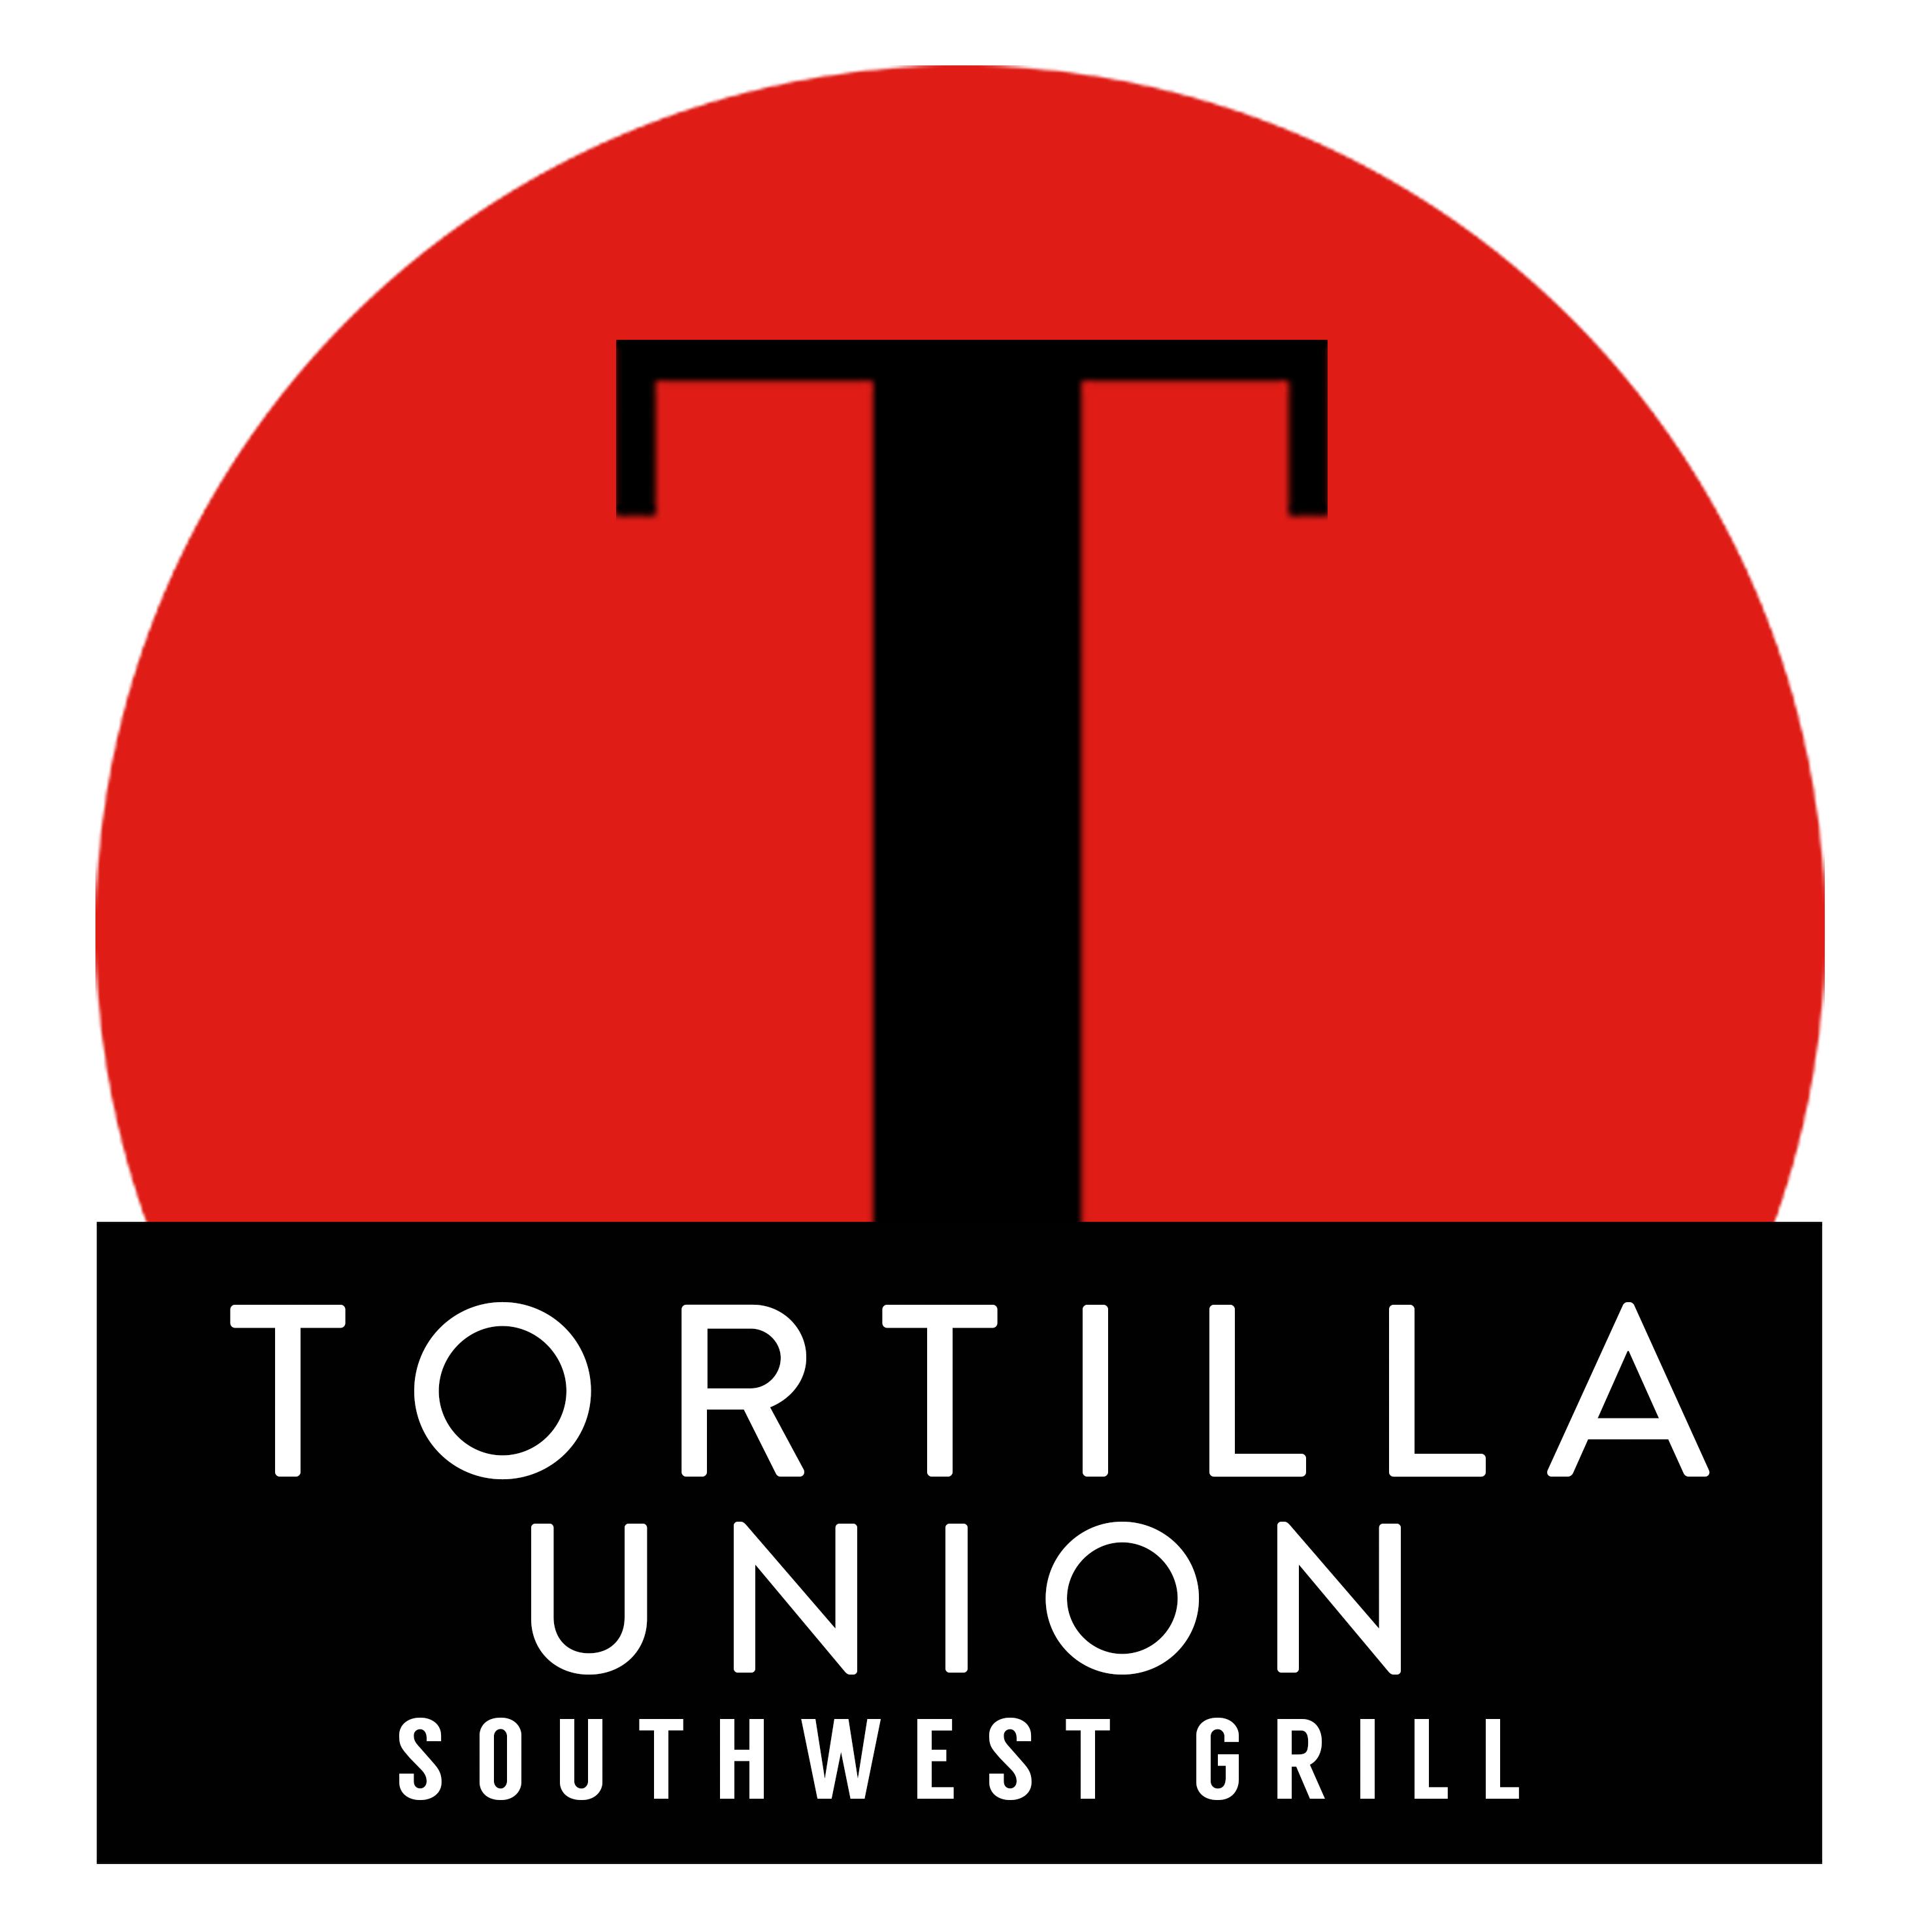 Tortilla Union Southwest Grill